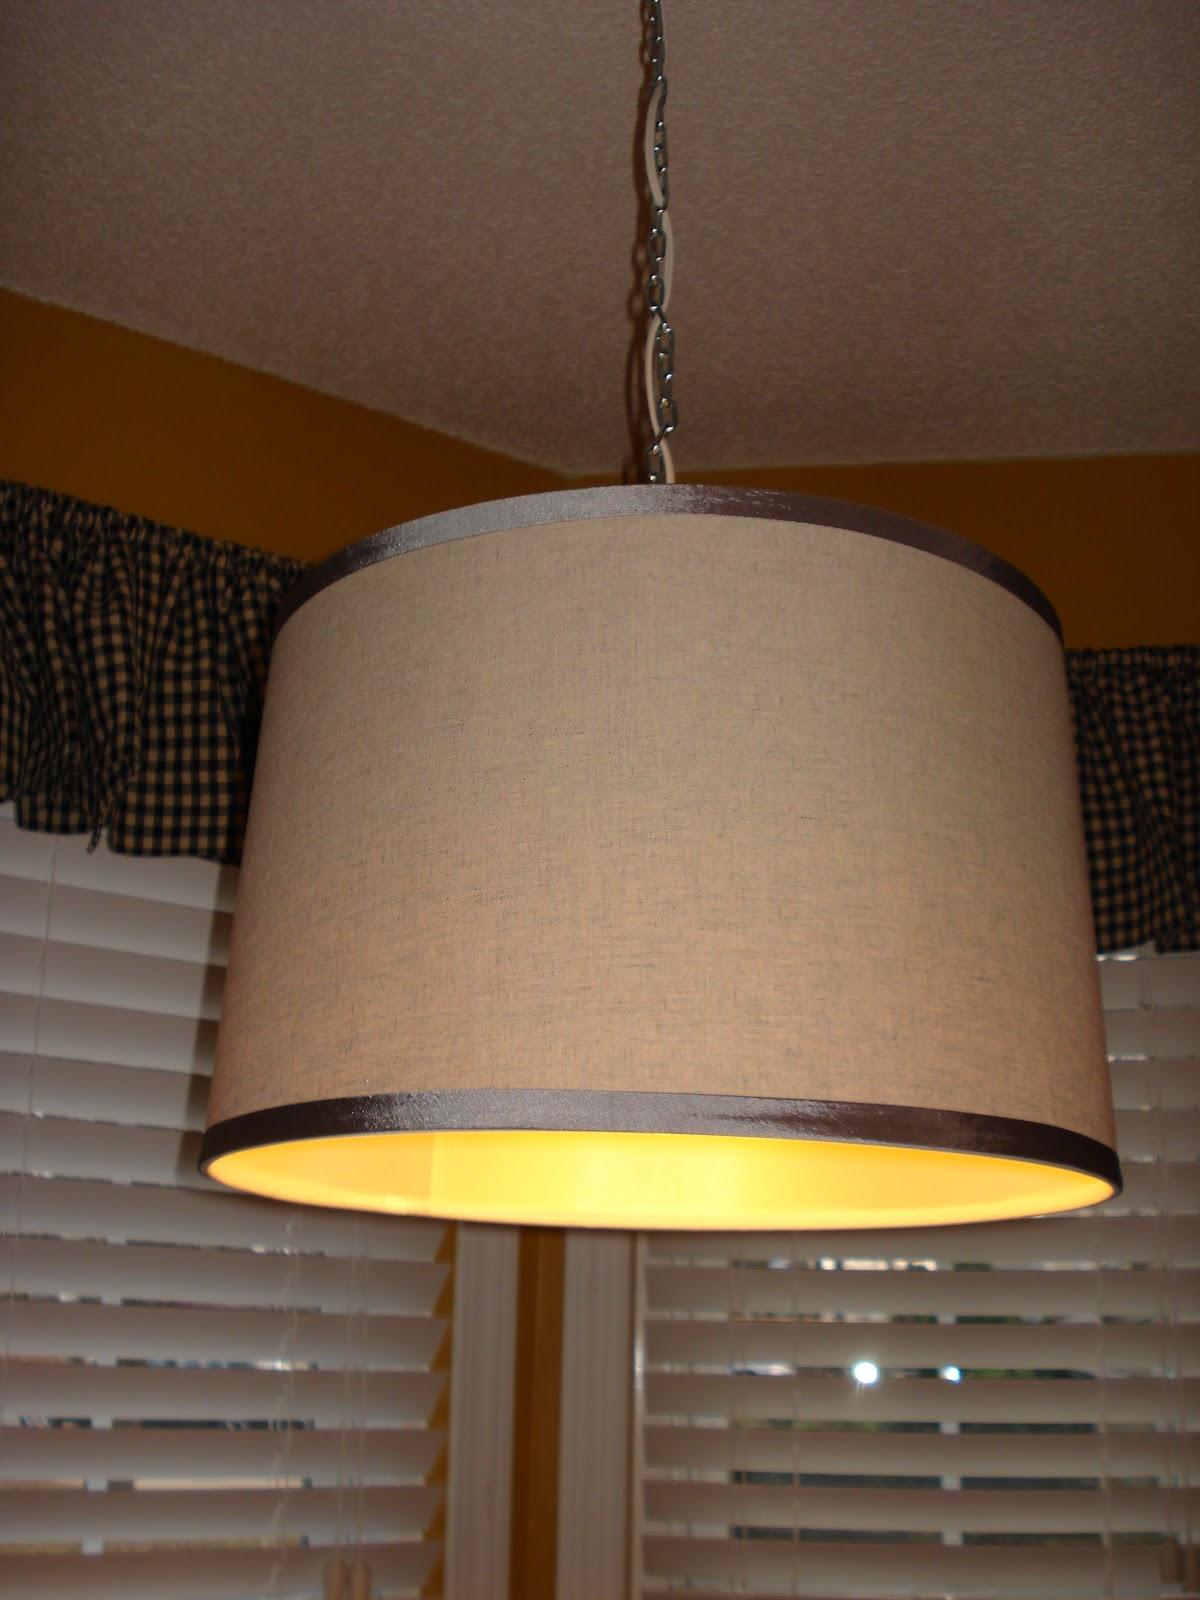 Simple Lamp Shades | Interior Design And Deco